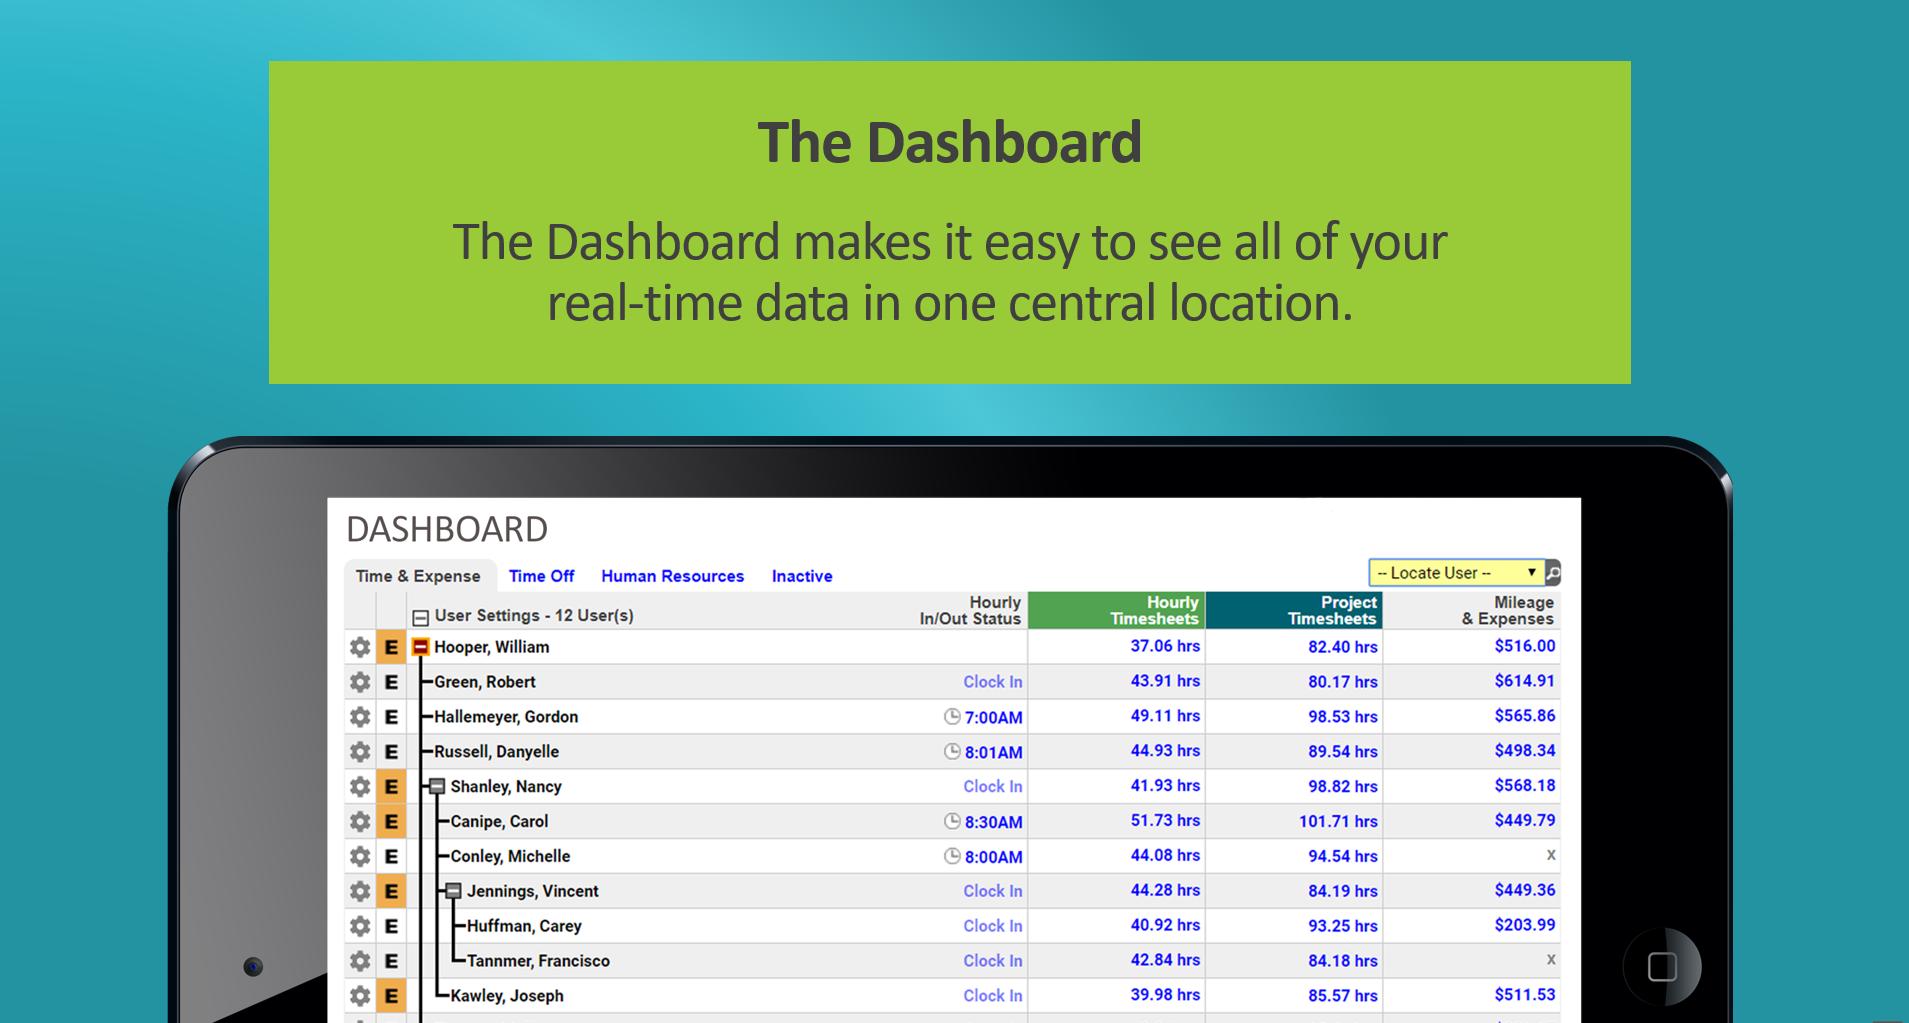 Timesheets.com Demo - The Dashboard